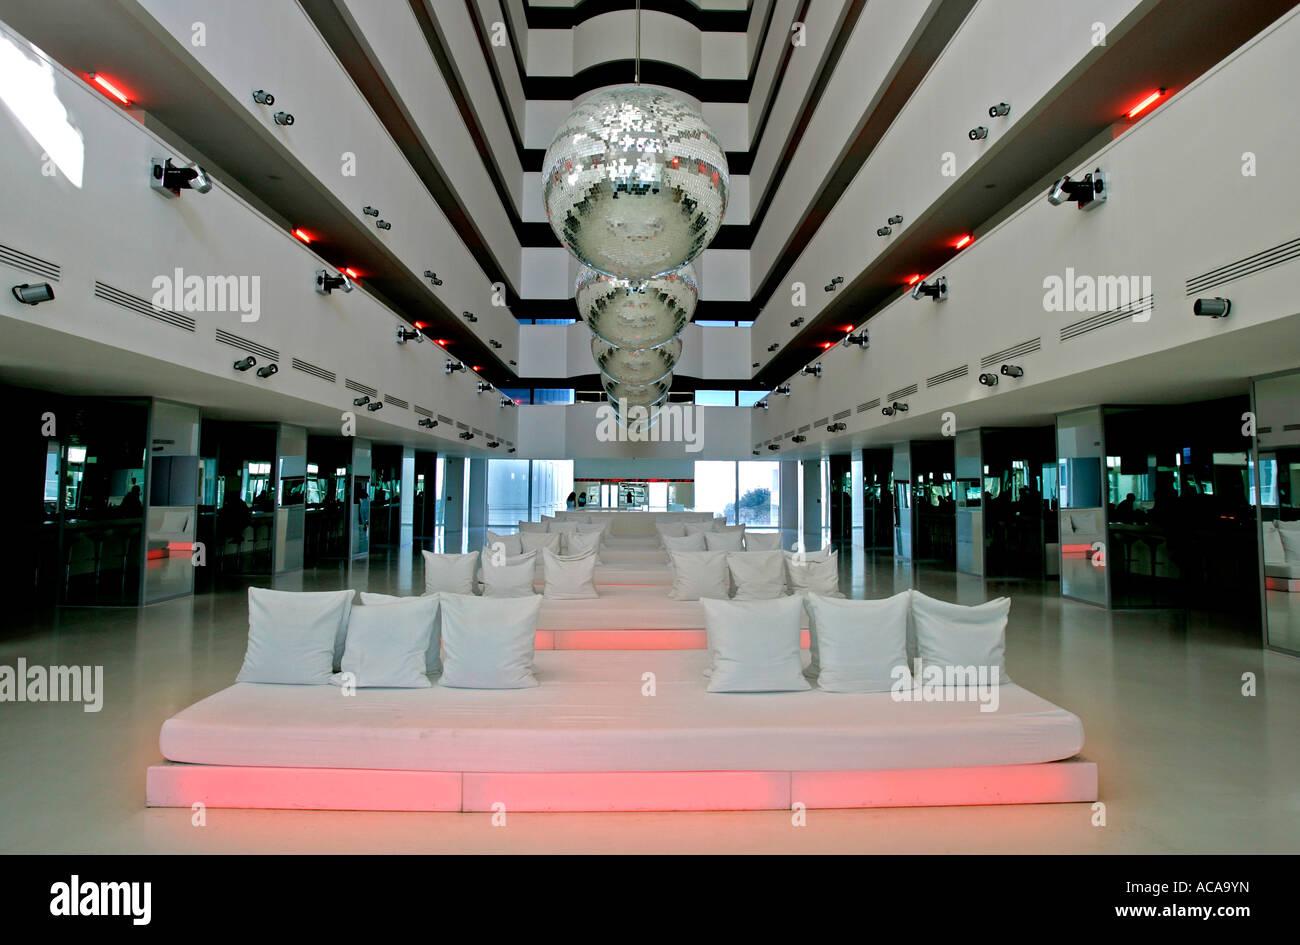 Lobby, 5-star Resort Hotel, Hillside SU, Antalya, Turkey - Stock Image